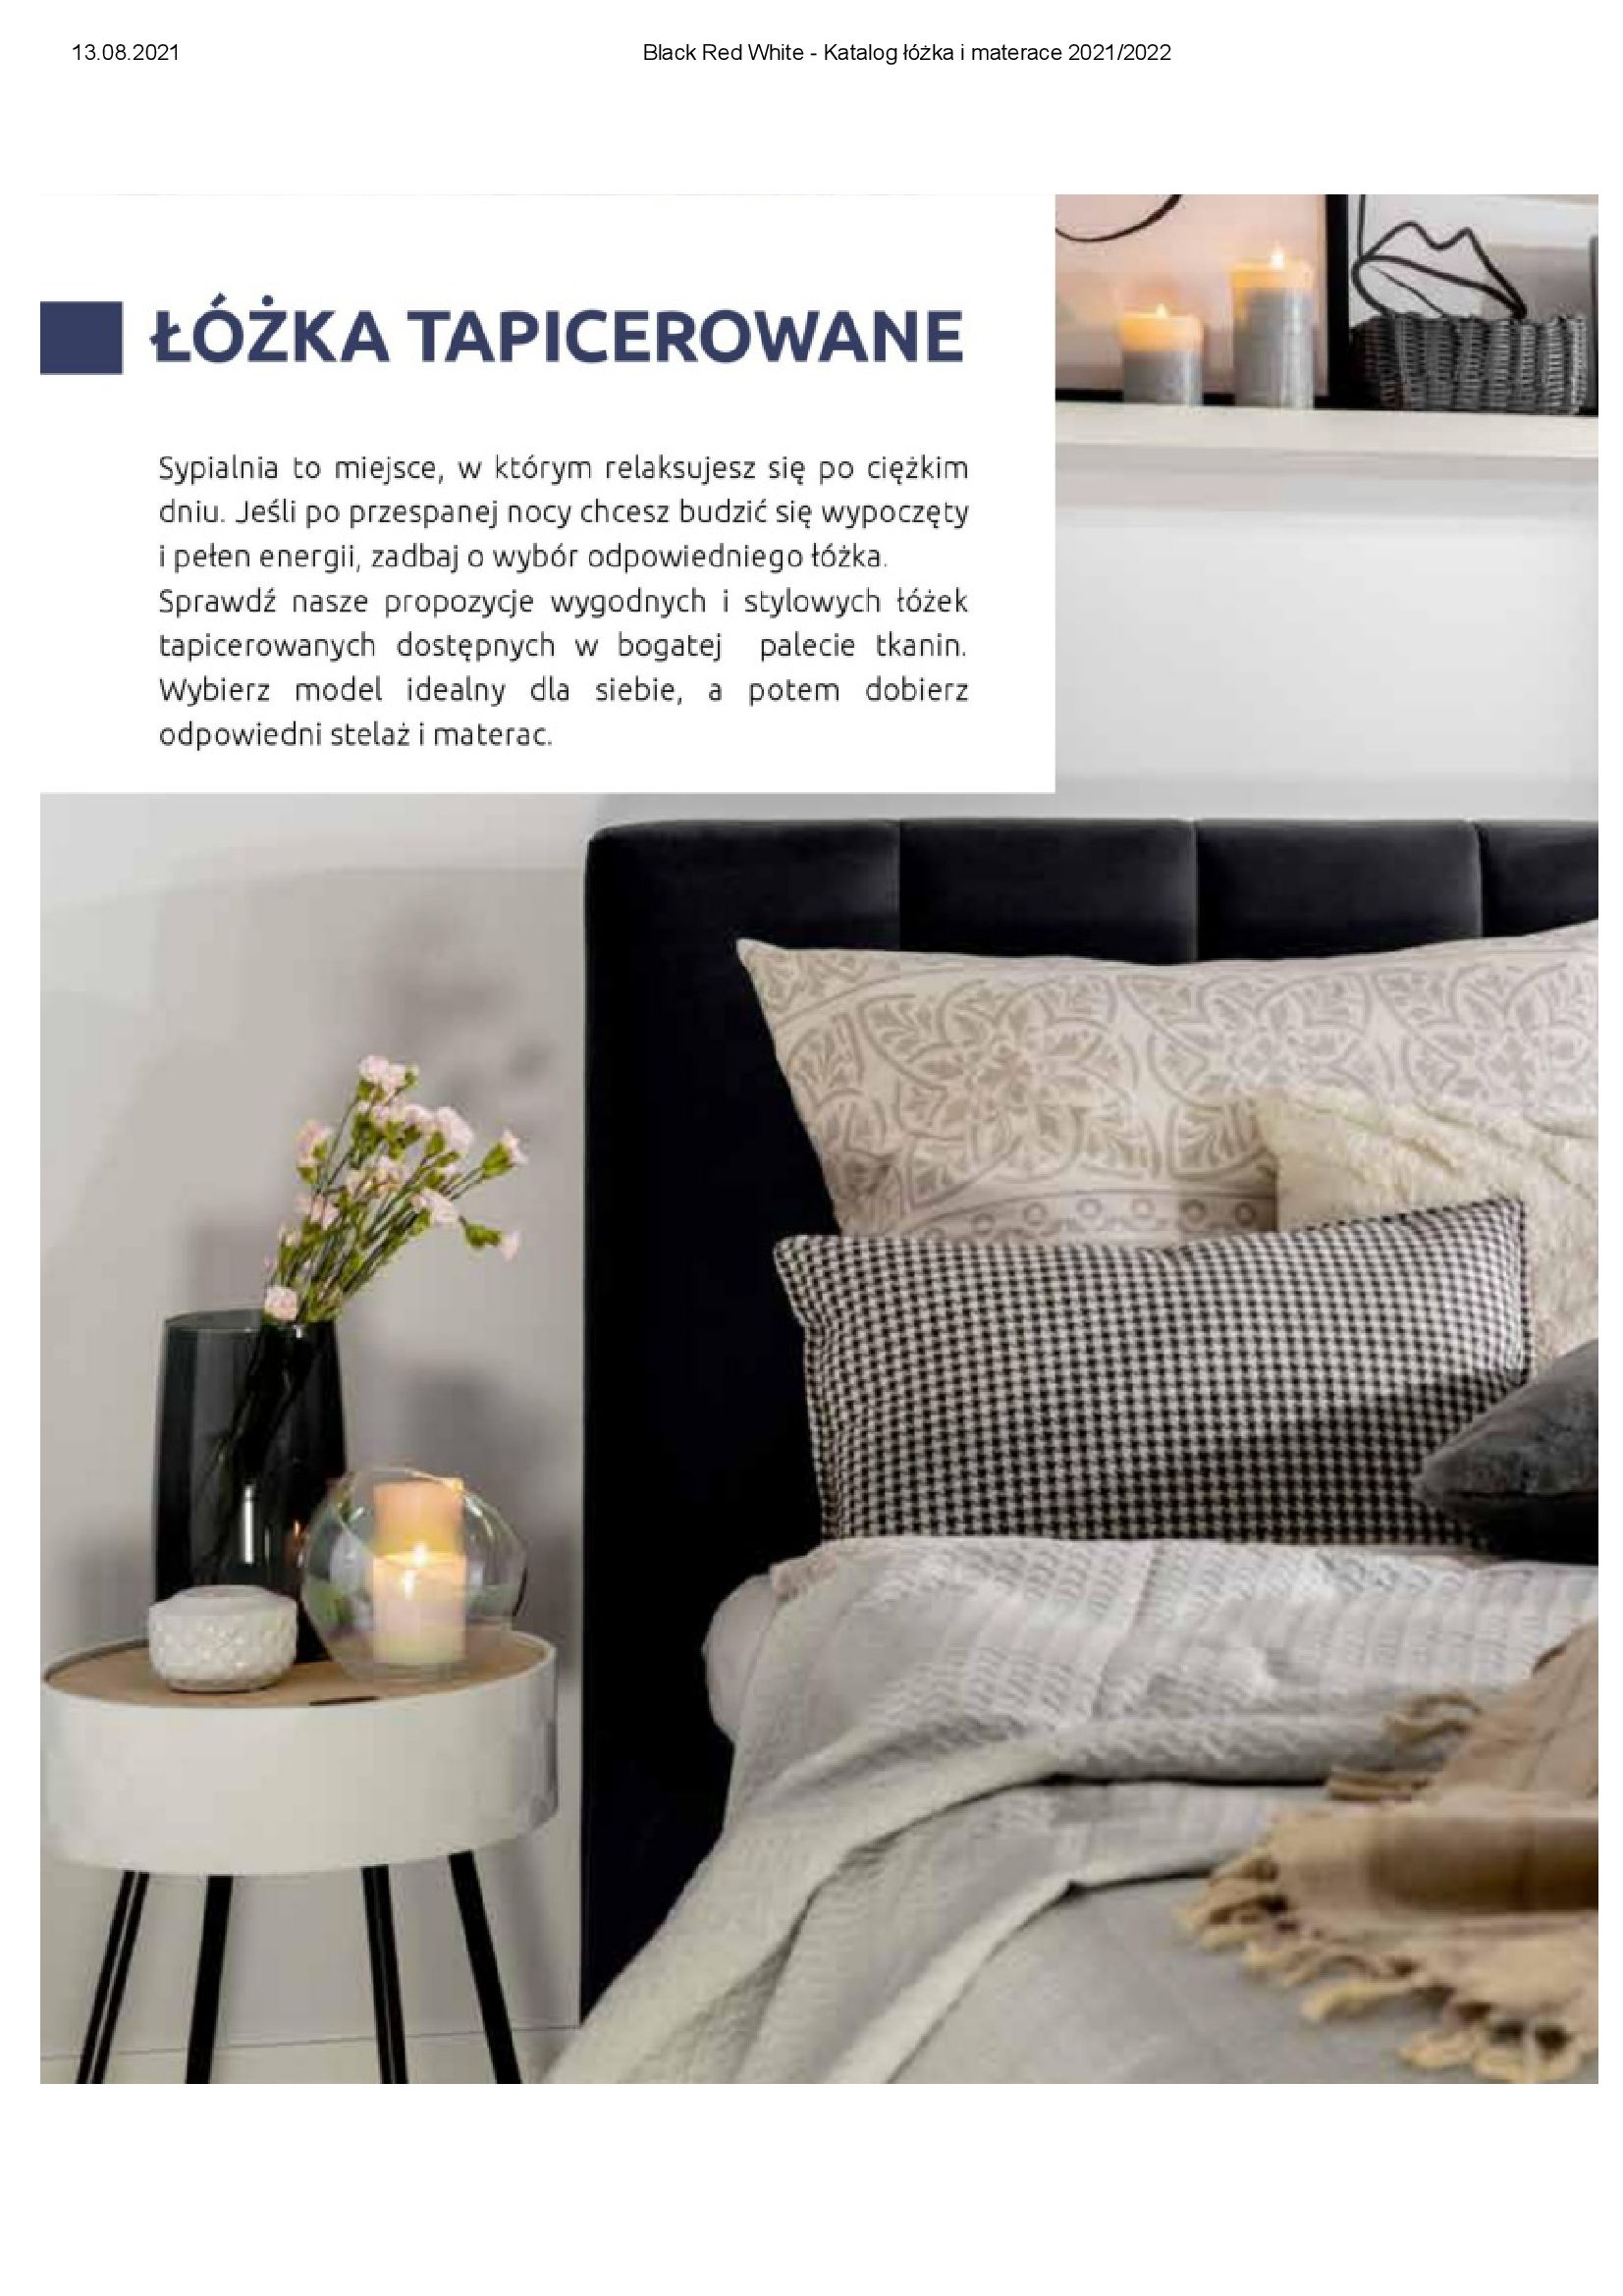 Gazetka Black Red White: Katalog Black Red White - Łóżka i Materace 2021-08-13 page-10